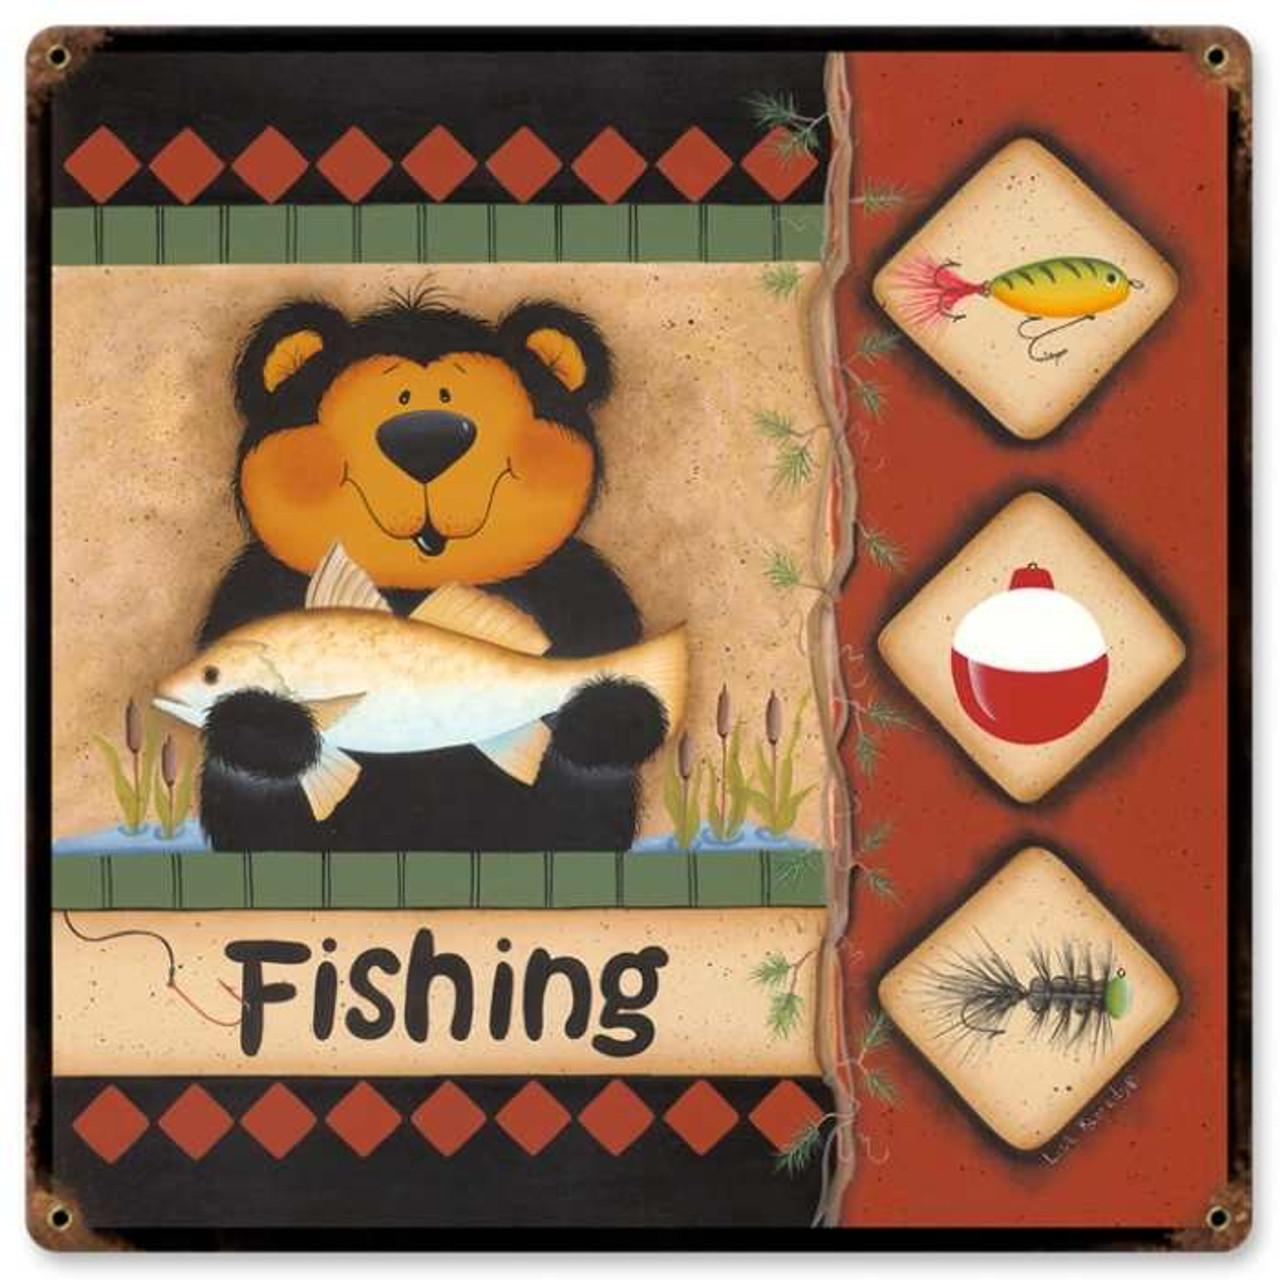 Retro Fishing Bear Metal Sign 18 x 18 Inches